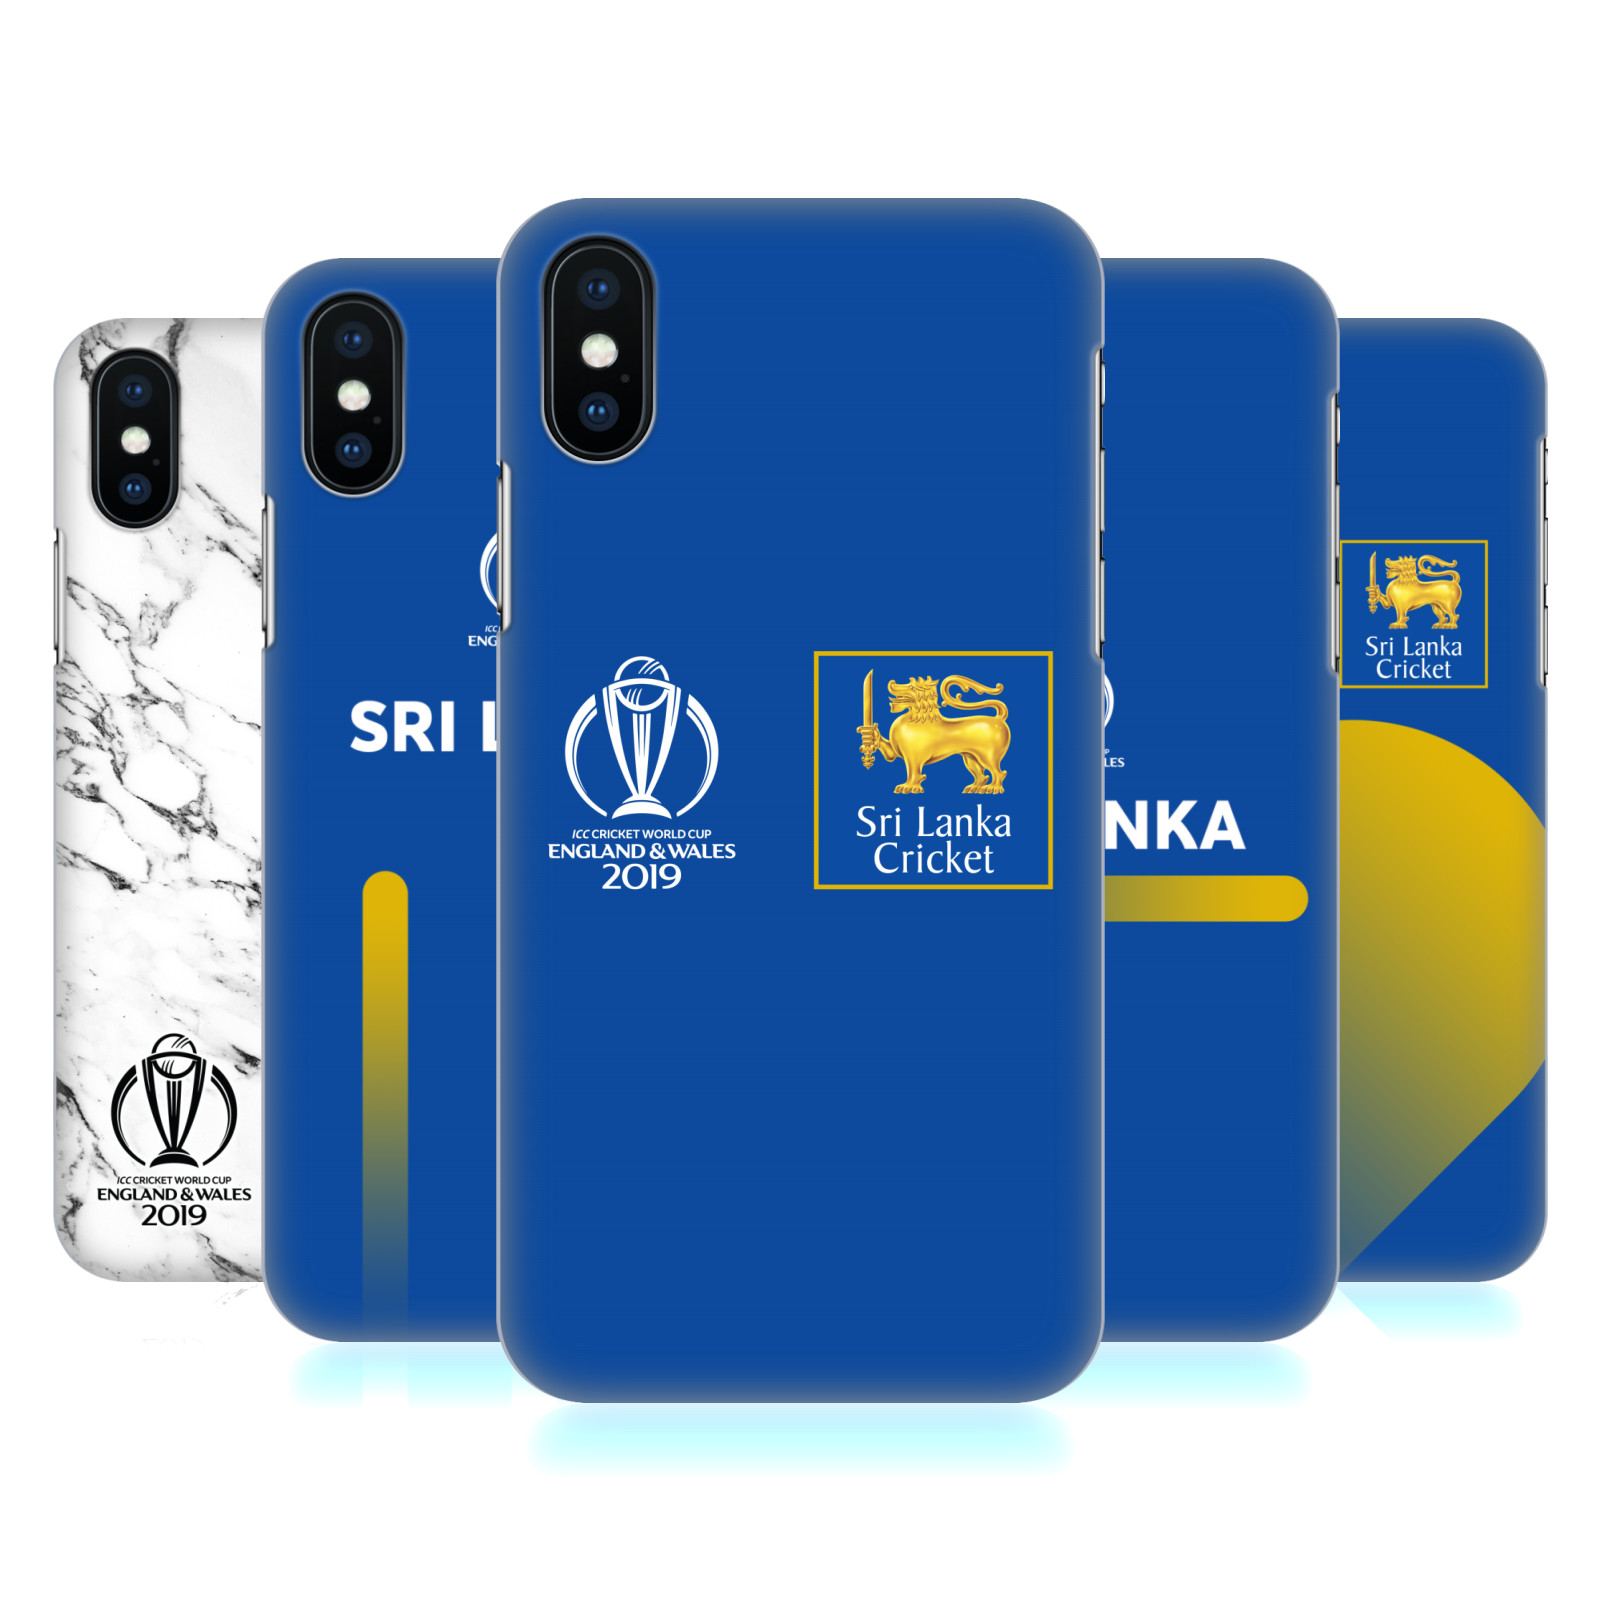 International Cricket Council Sri Lanka Cricket World Cup